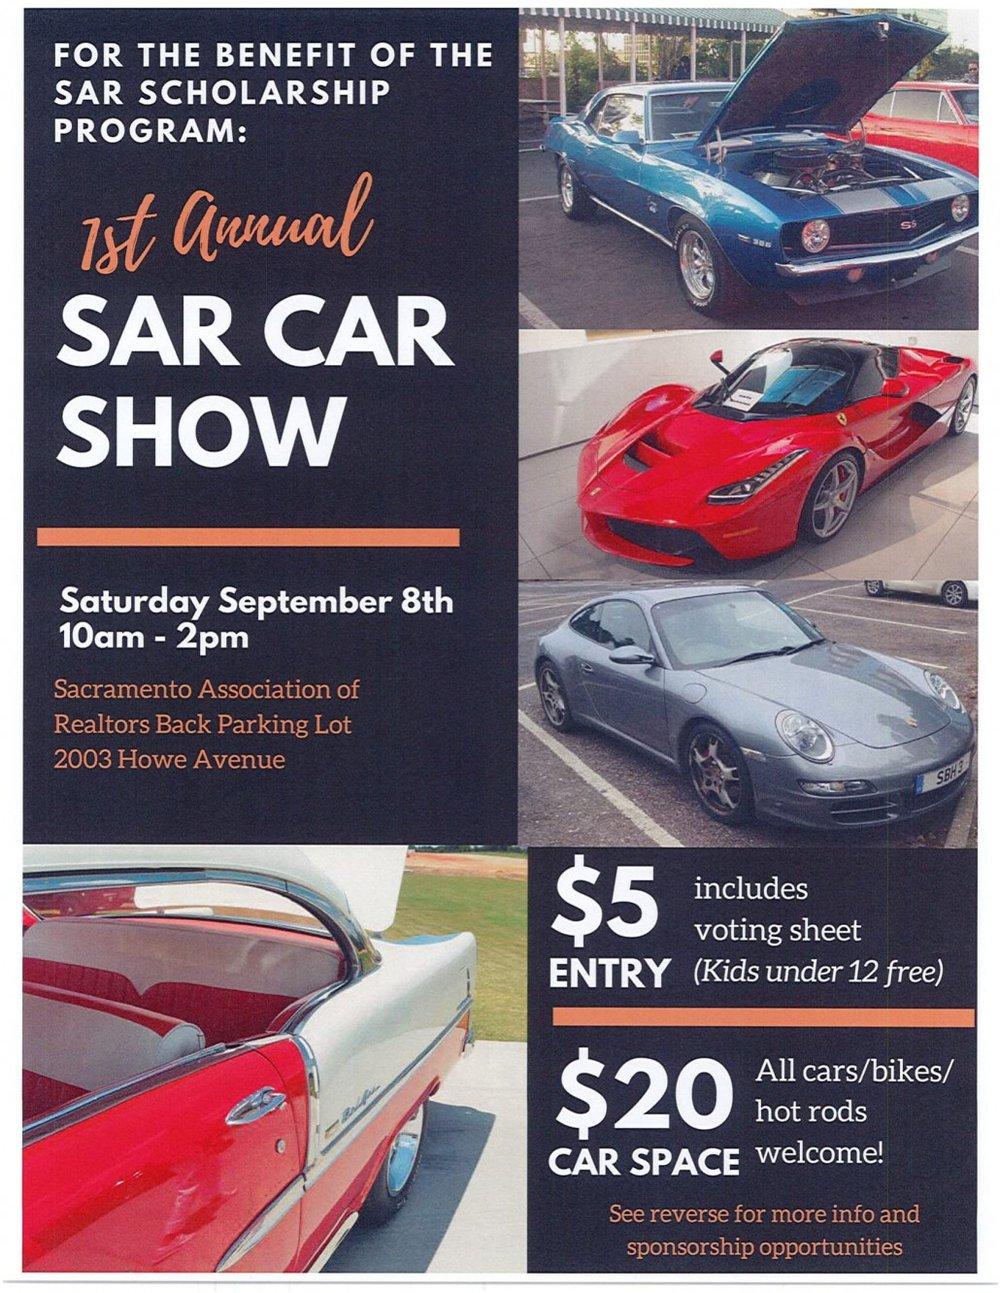 sar-car-show-1_1030x1332.jpg